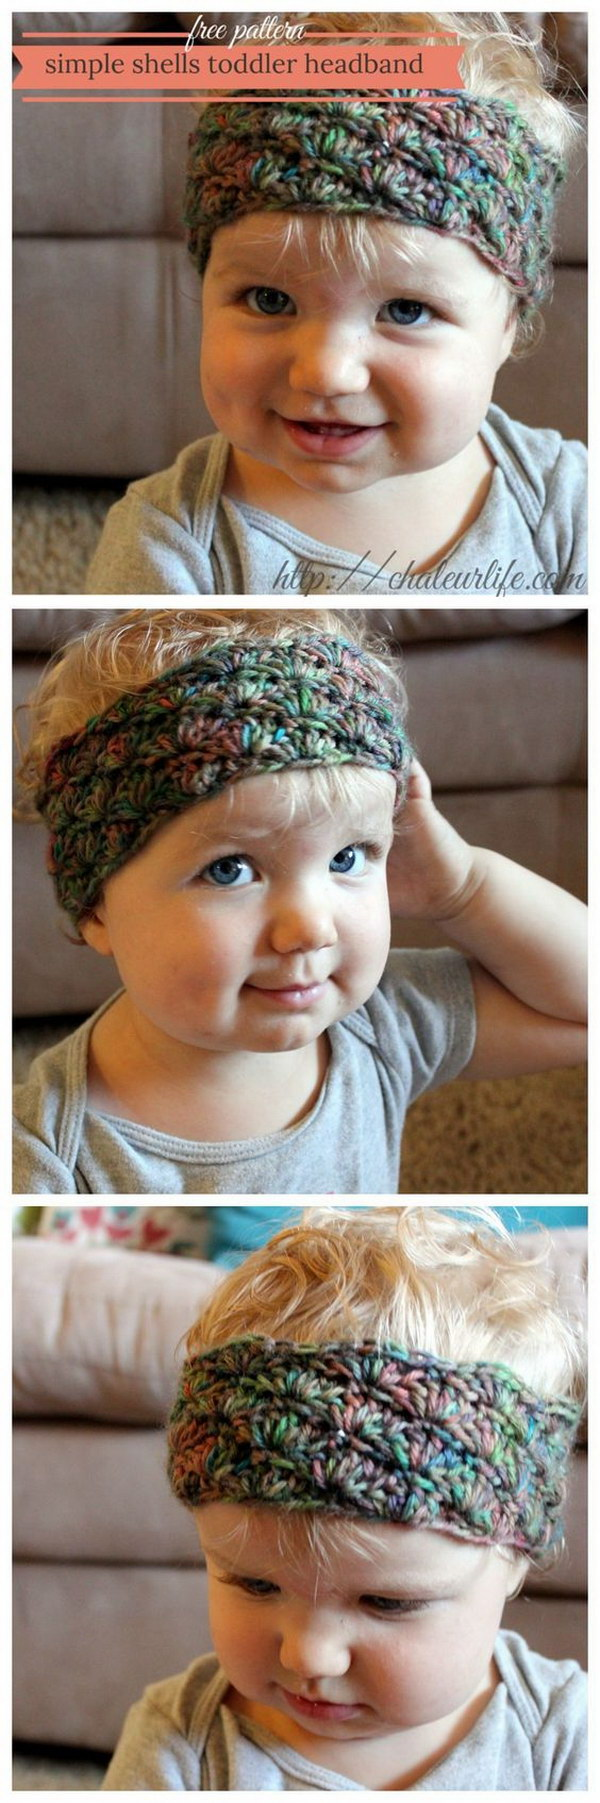 Simple Shells Toddler Headband.